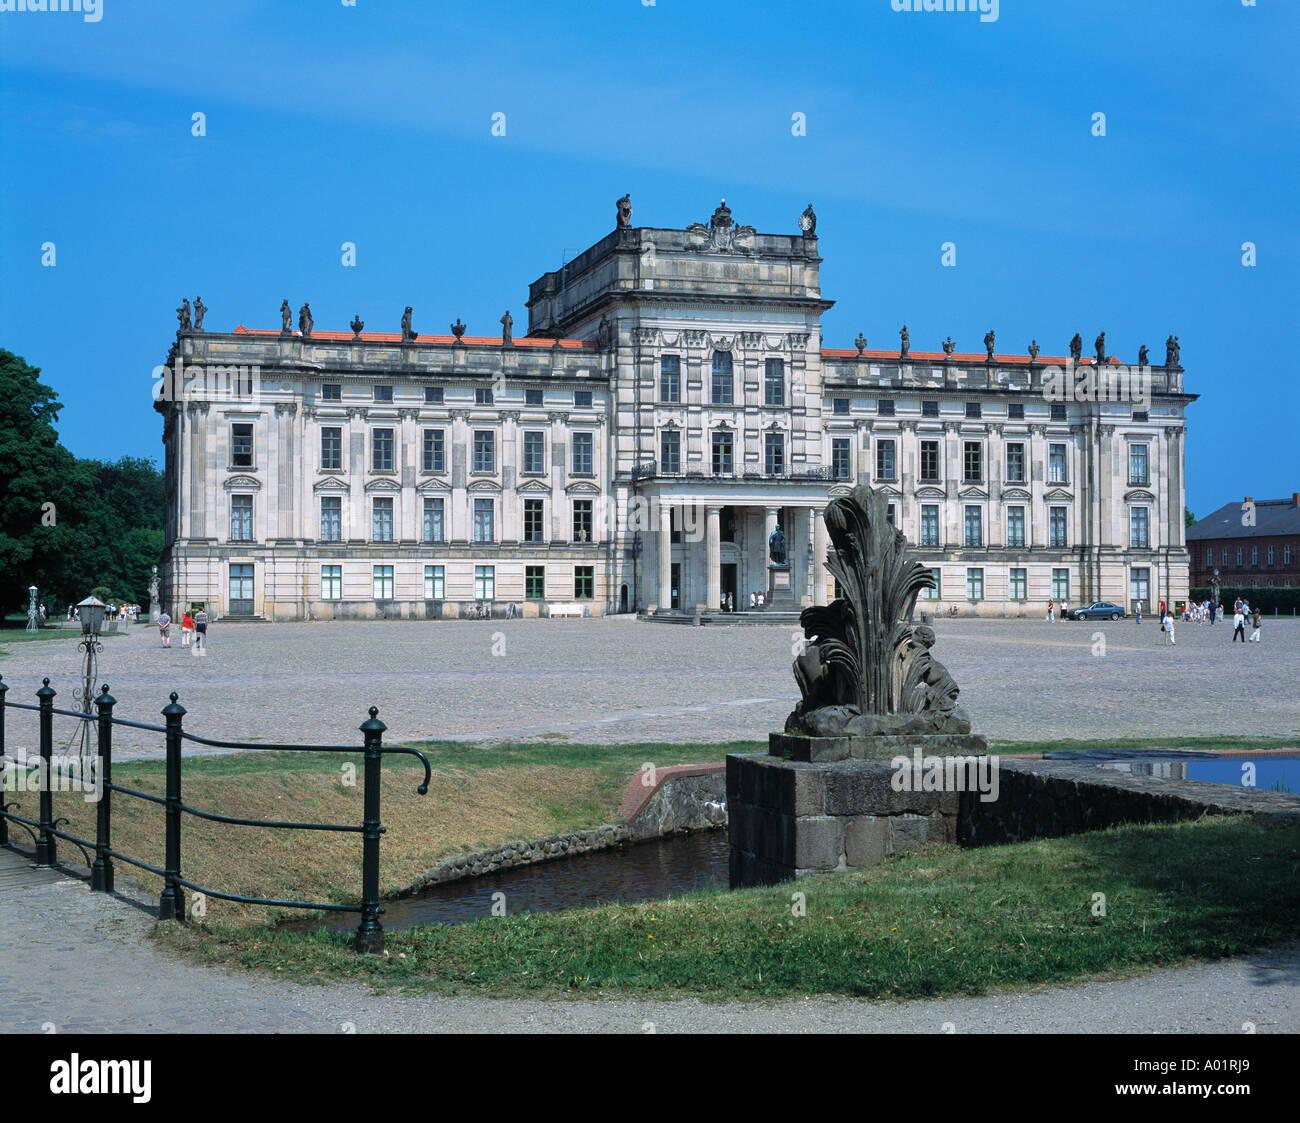 Barockschloss, Residenzschloss, Schlossplatz, Am Basin, Ludwigslust, Griese Gegend, Mecklenburg-Vorpommern Stock Photo